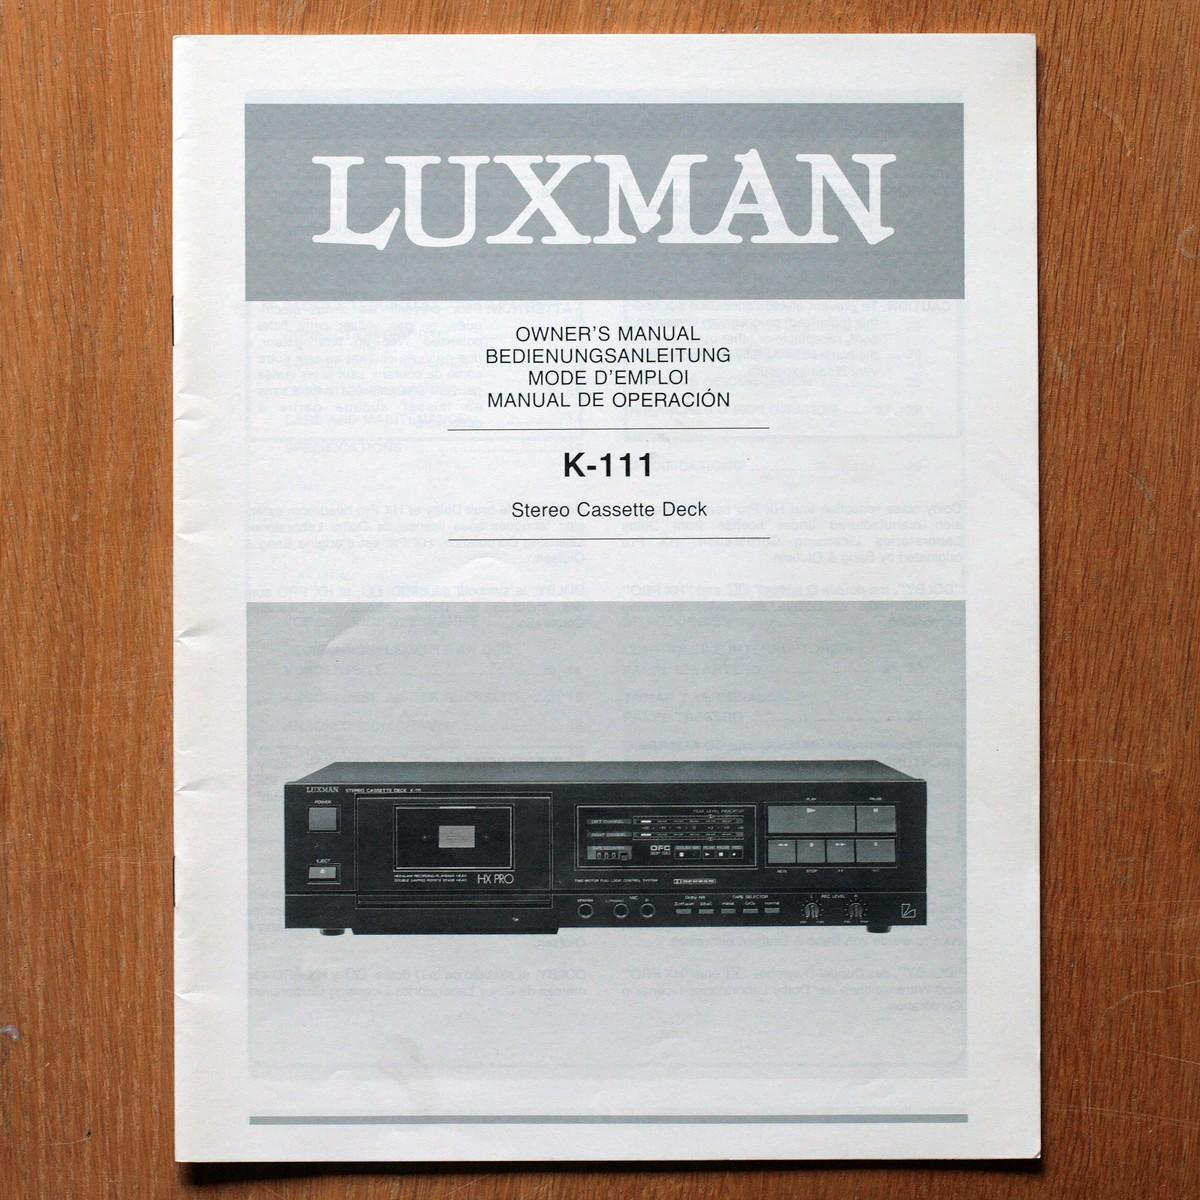 Luxman • Lecteur CD • DZ-92 • Manuel utilisateur • User manual • Bedienungsanleitung • Manual de operación